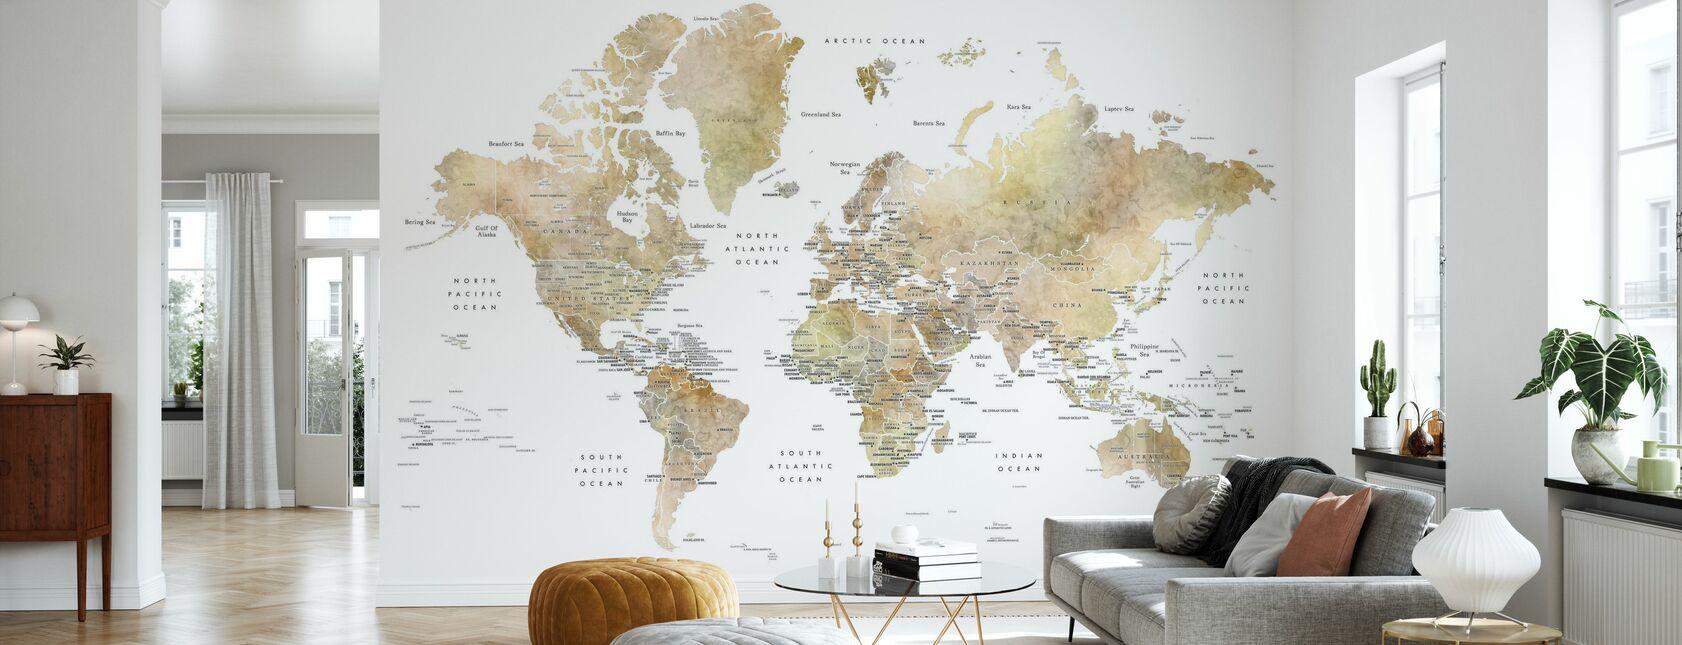 Wereldkaart met hoofdsteden - Behang - Woonkamer